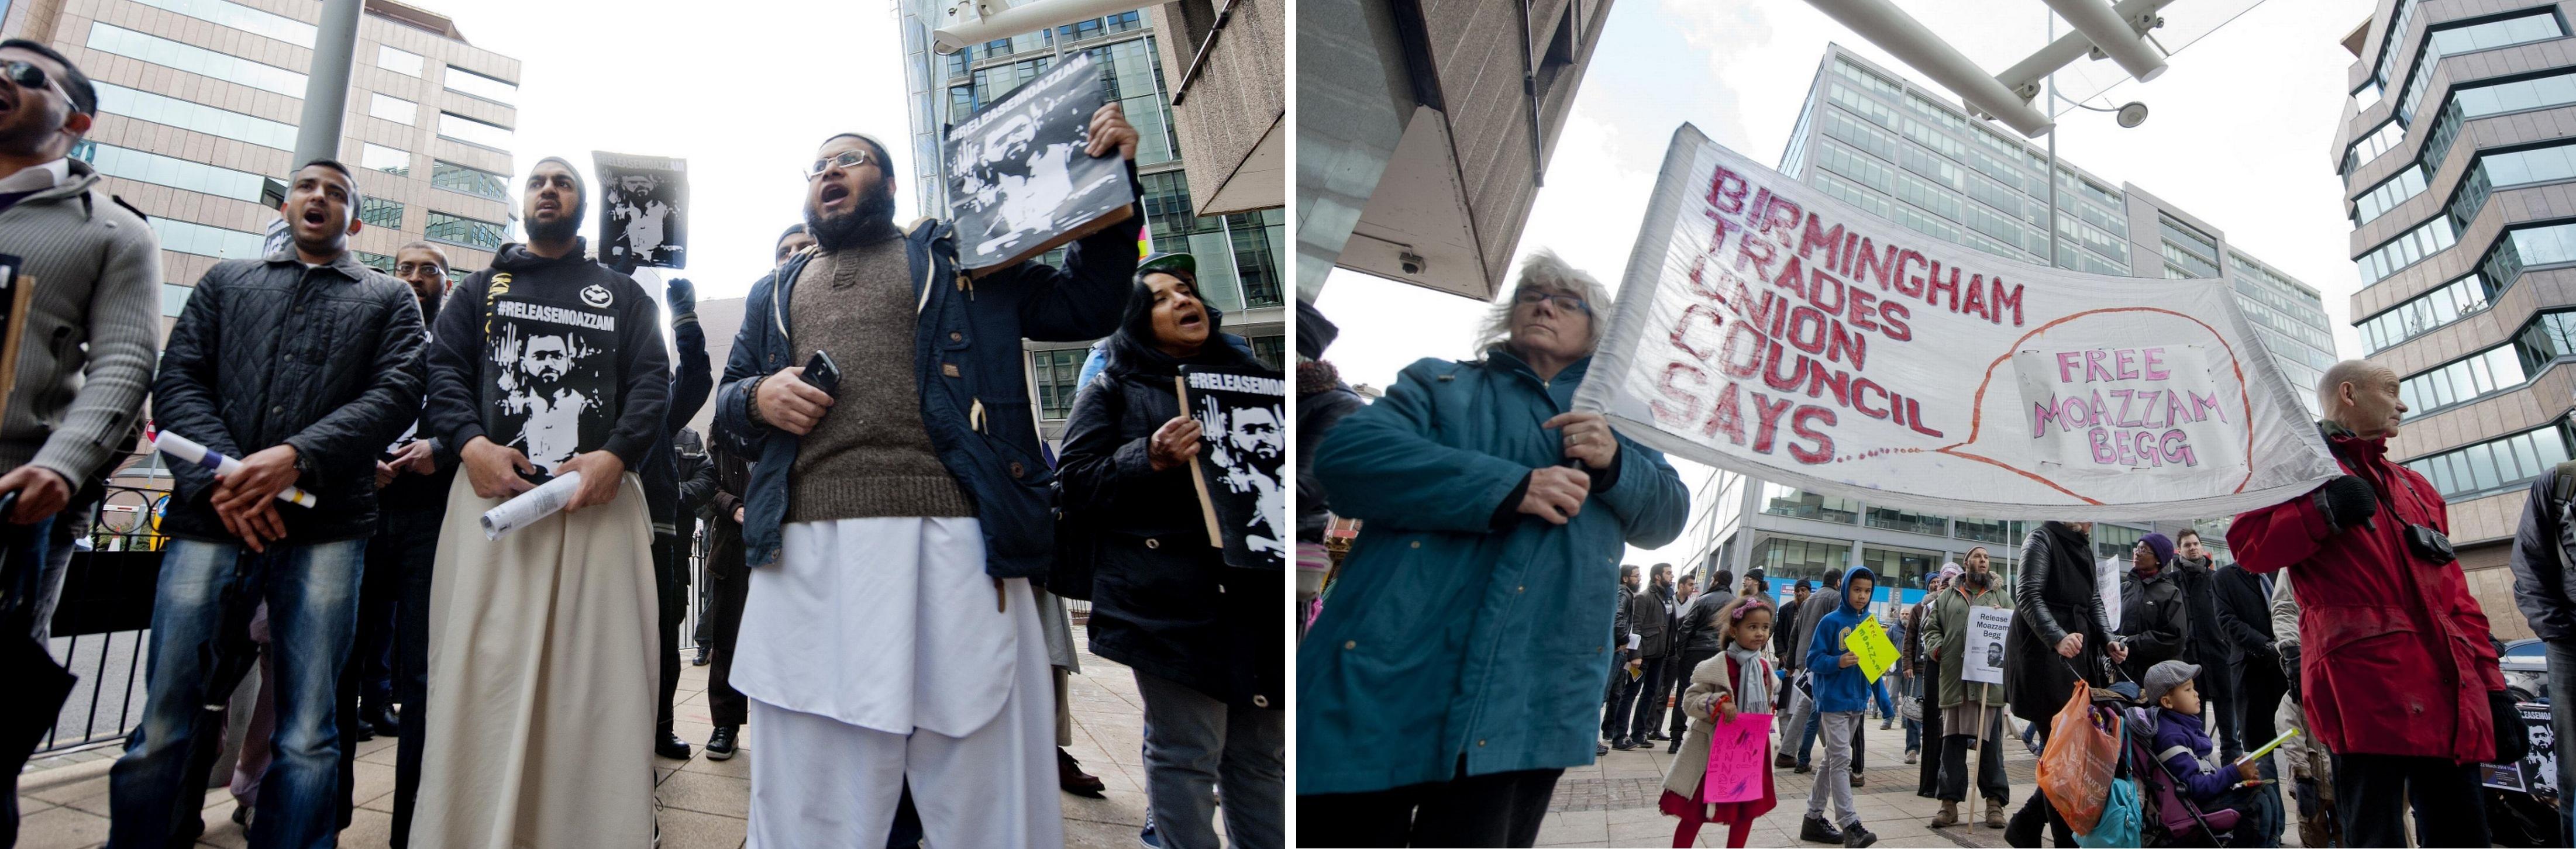 Moazzam Begg protest Birmingham (2)